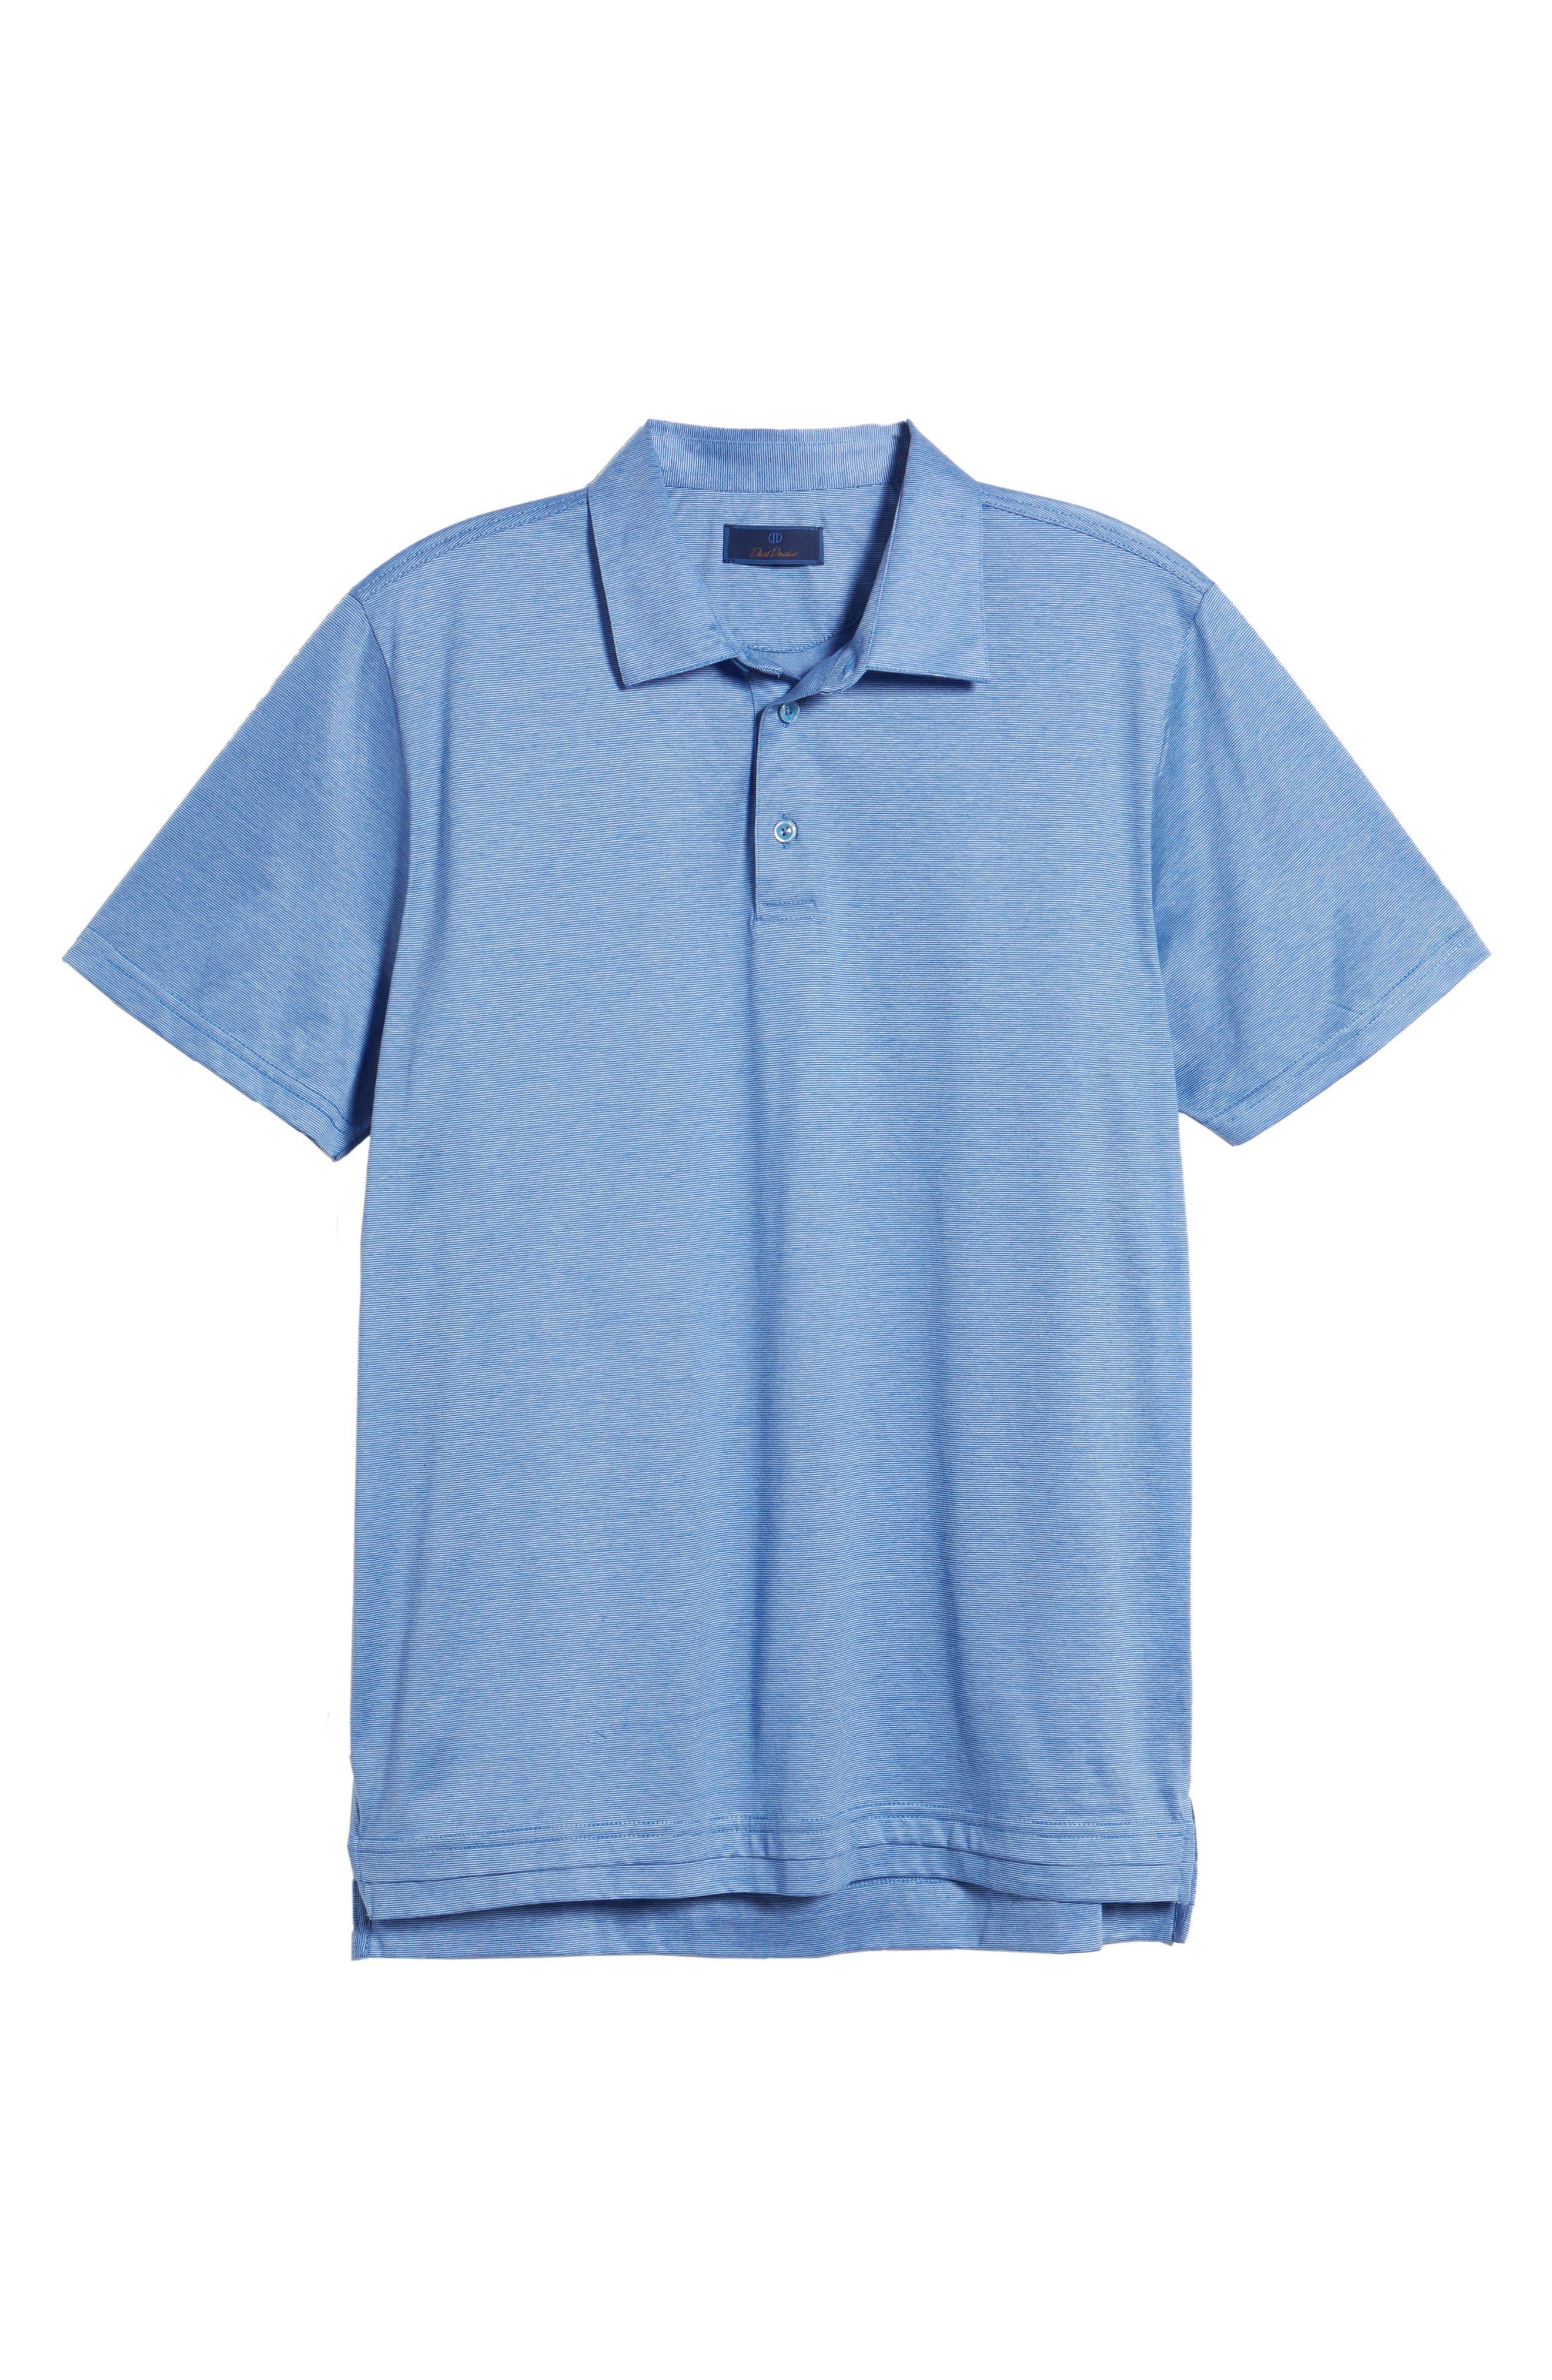 Fine Line Polo,                             Alternate thumbnail 6, color,                             Blue